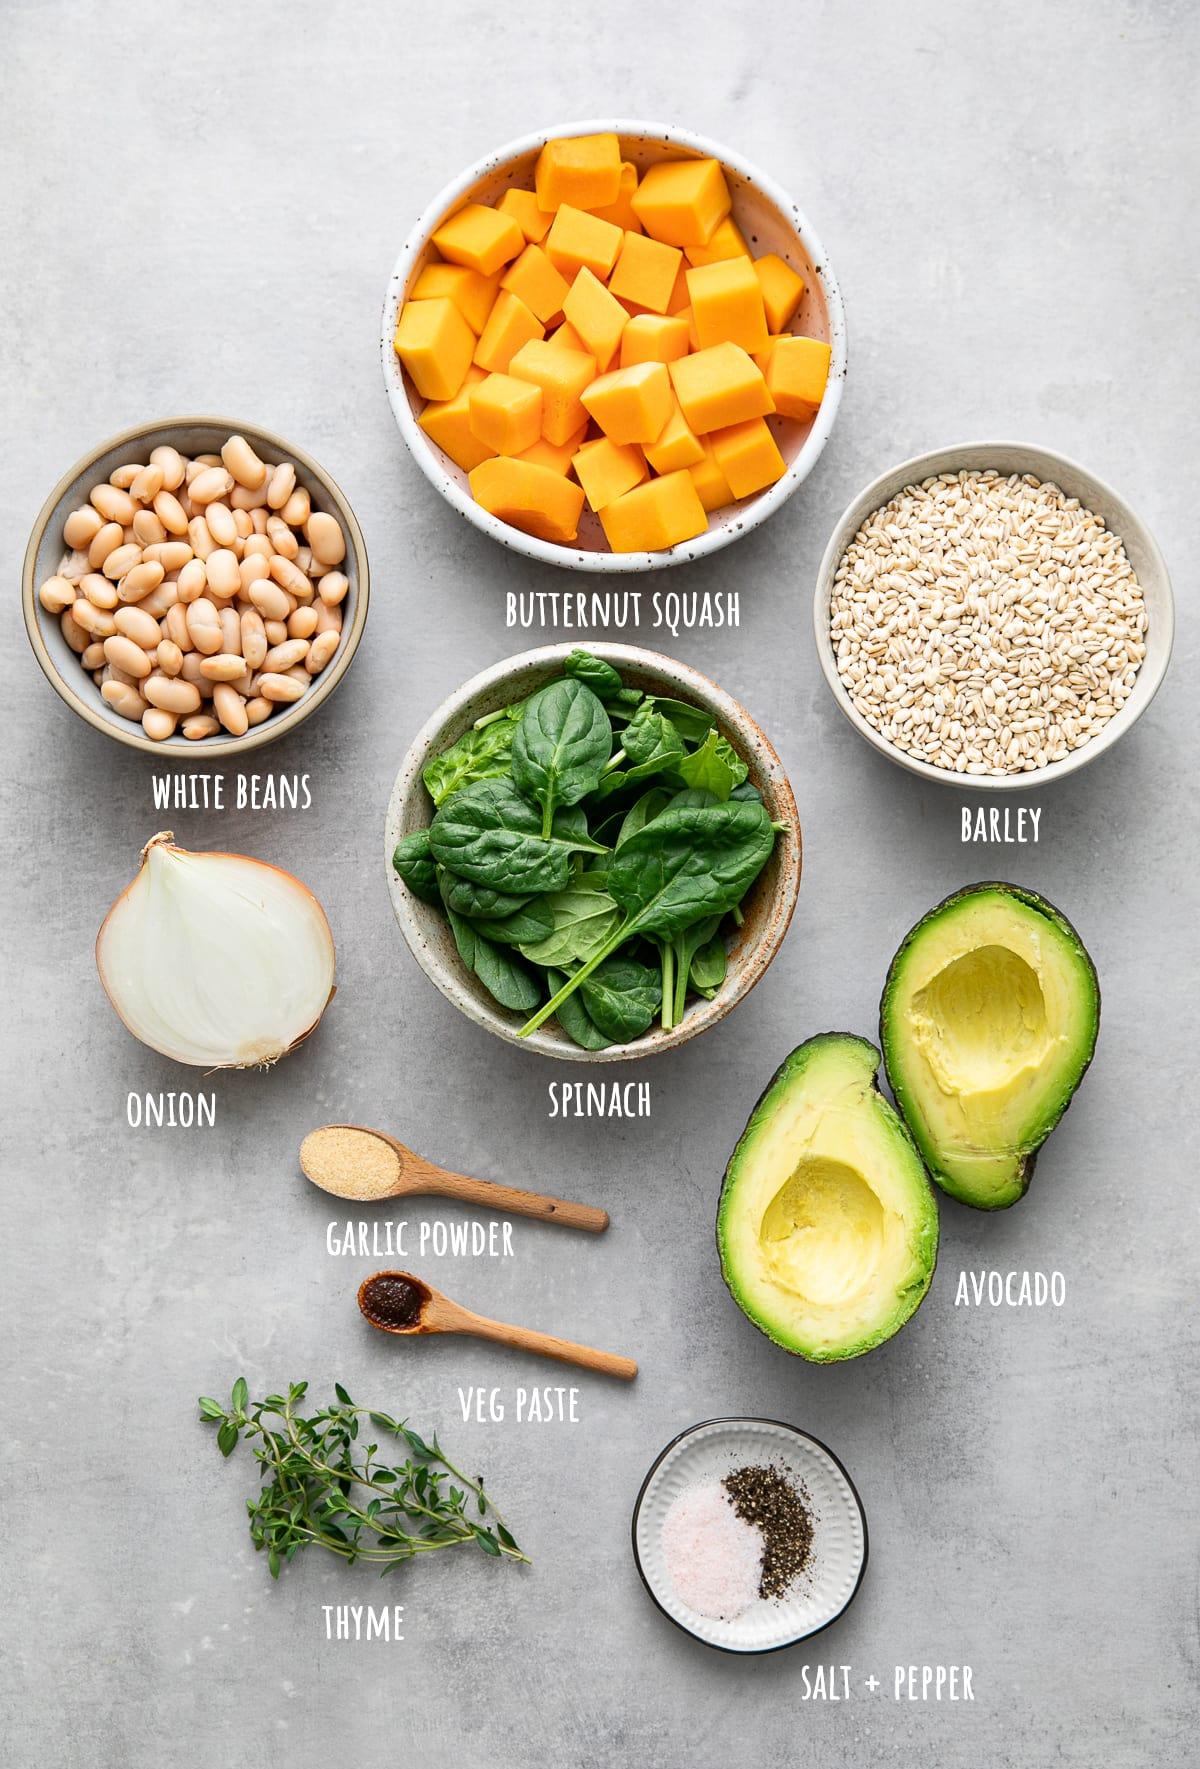 top down view of ingredients used to make healthy barley grain bowl recipe.